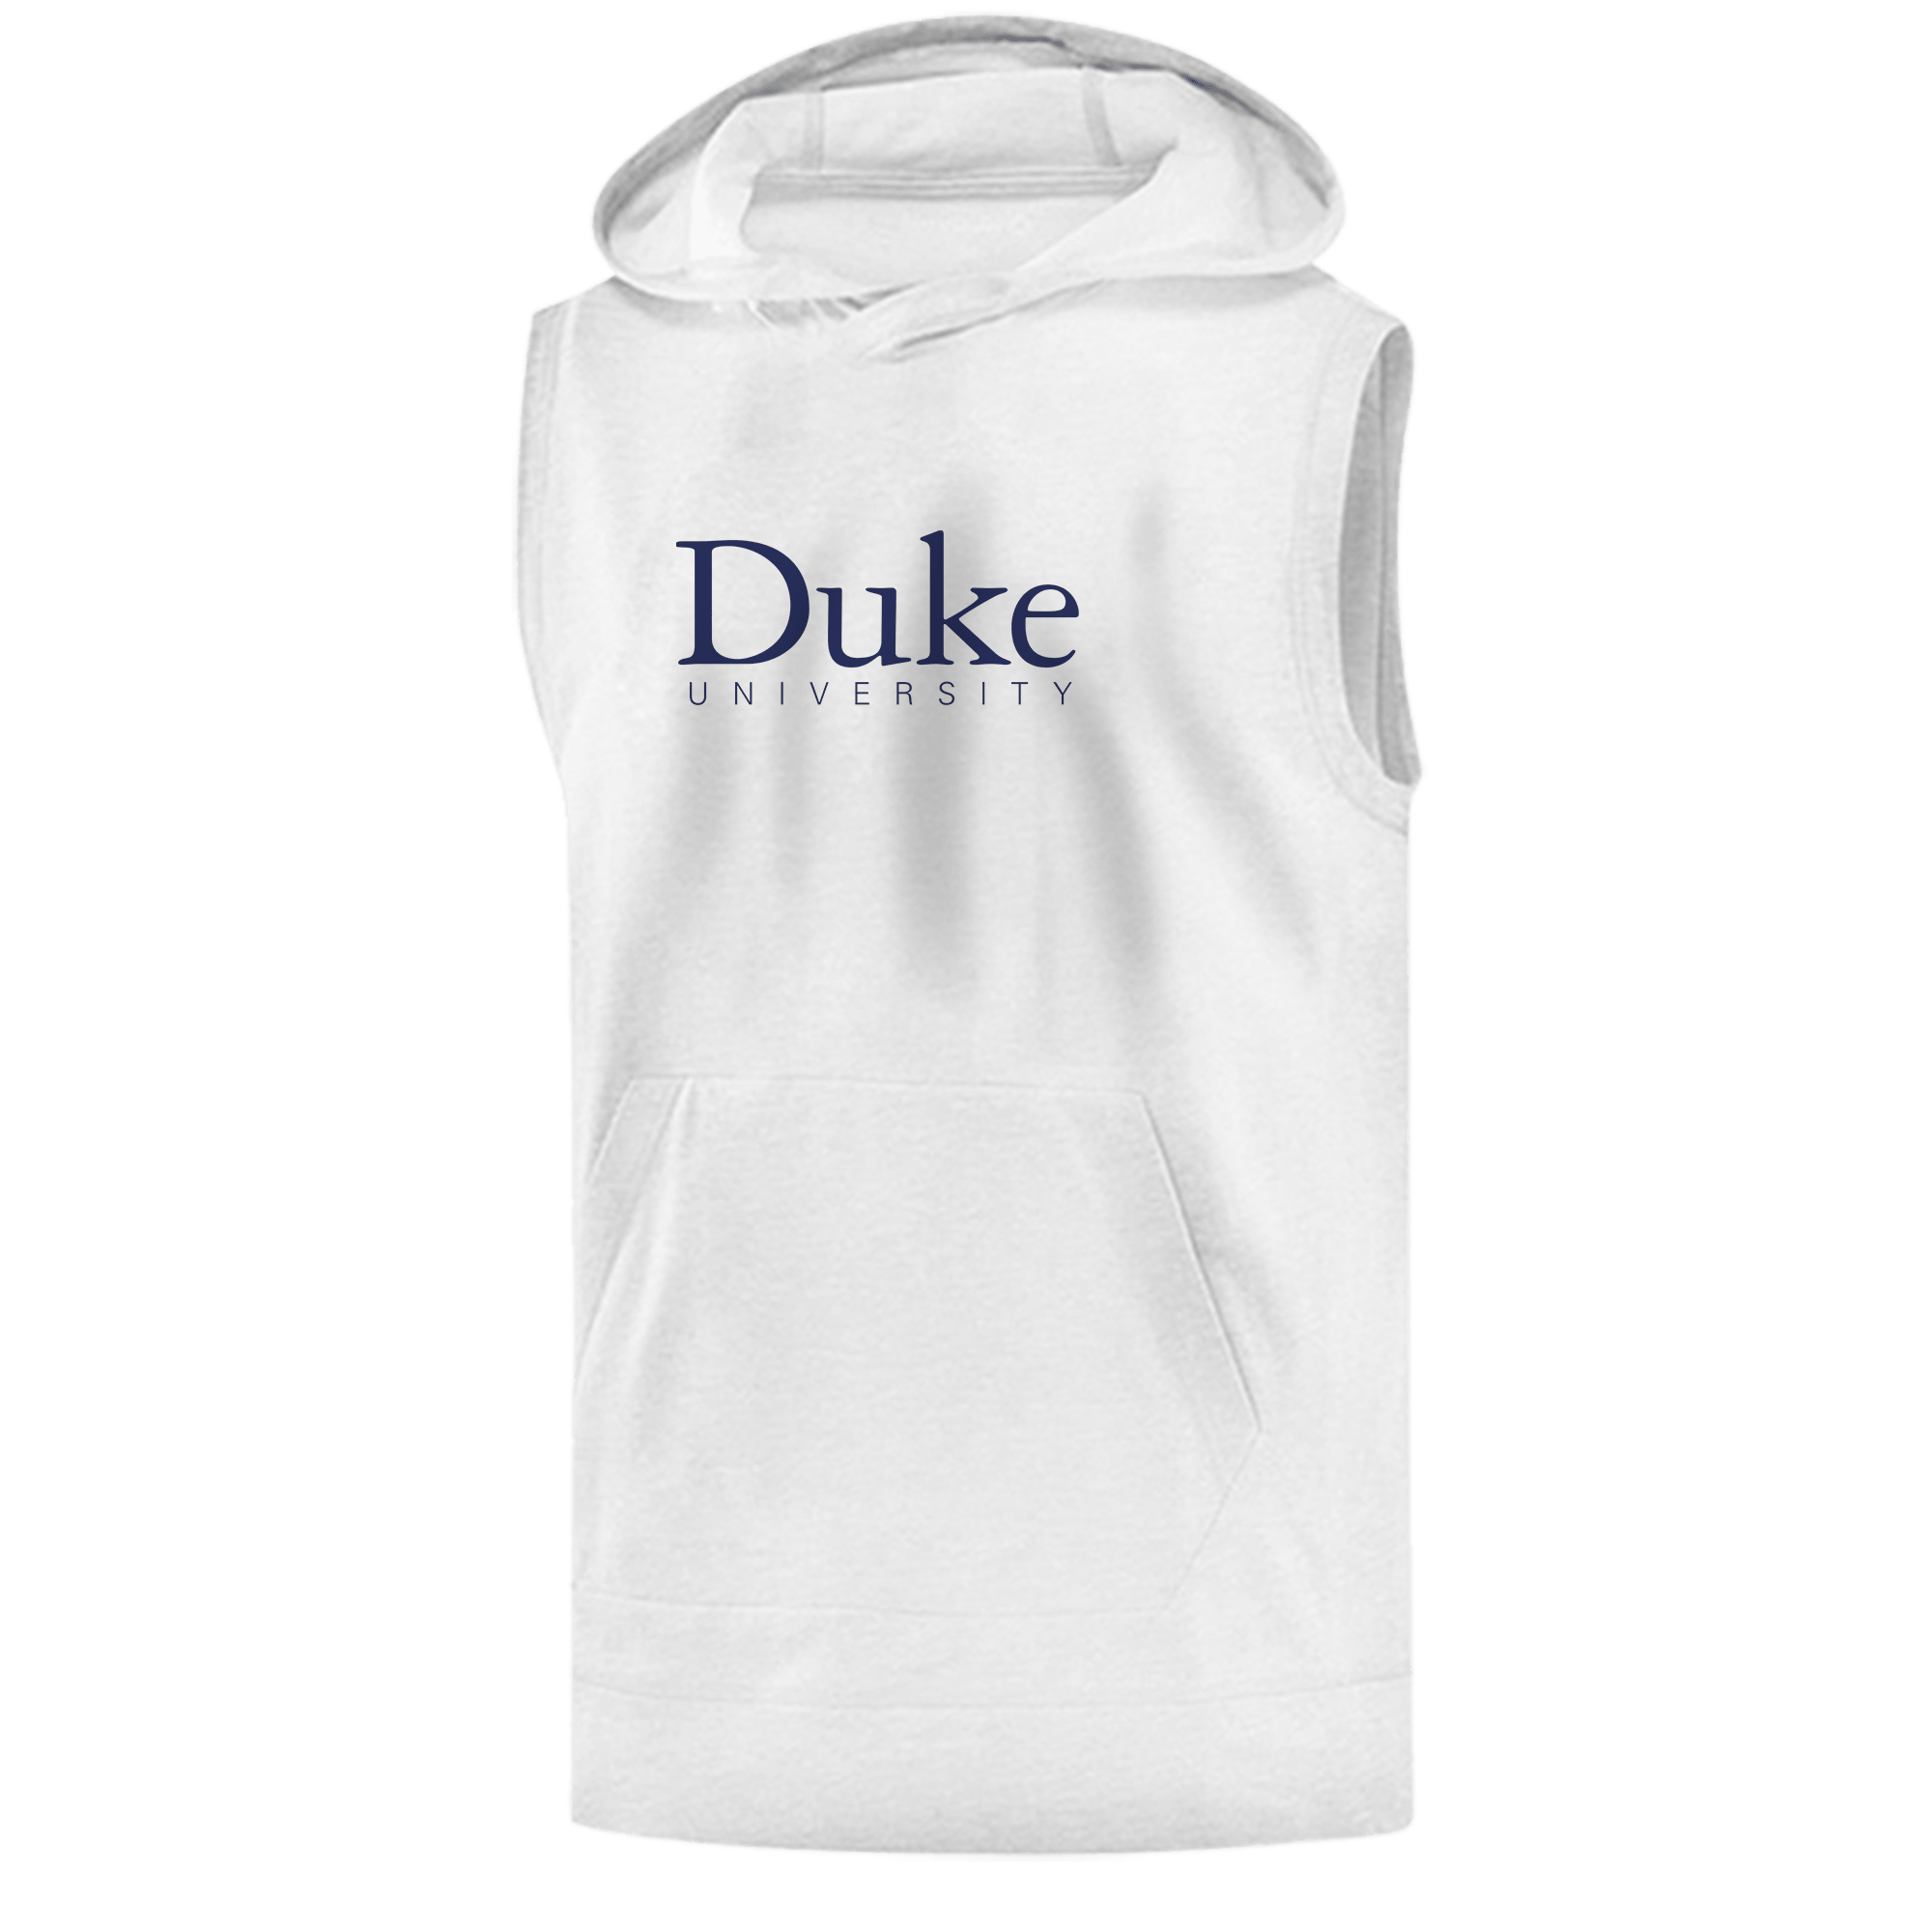 Duke University Sleeveless (KLS-WHT-ncaa-NP-duke-512)